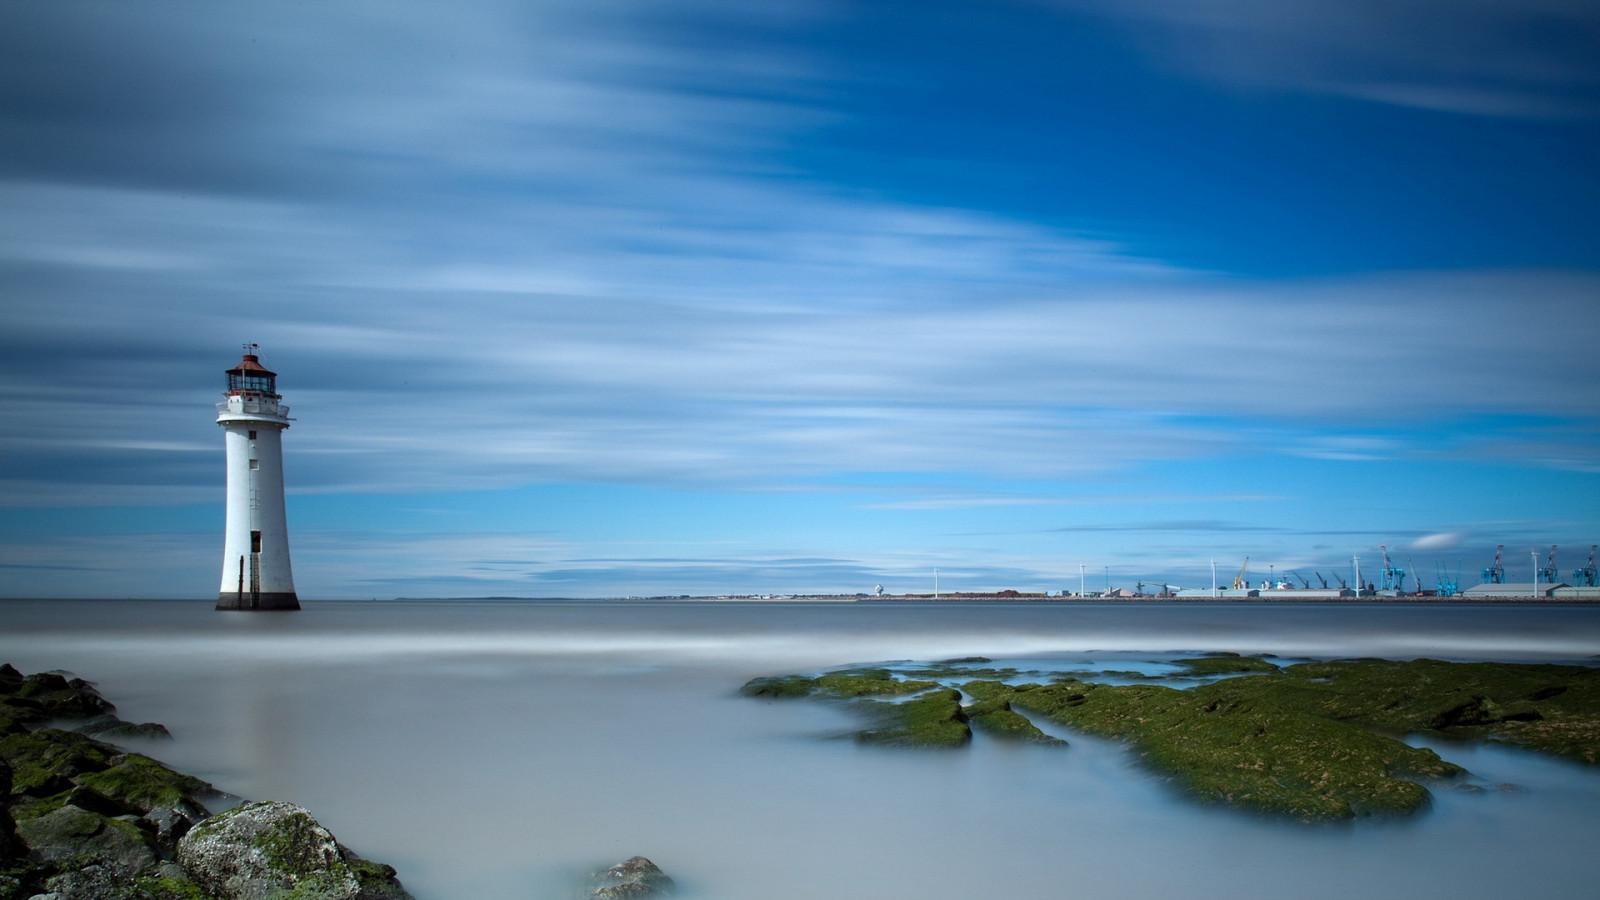 День добра, картинки маяки на море